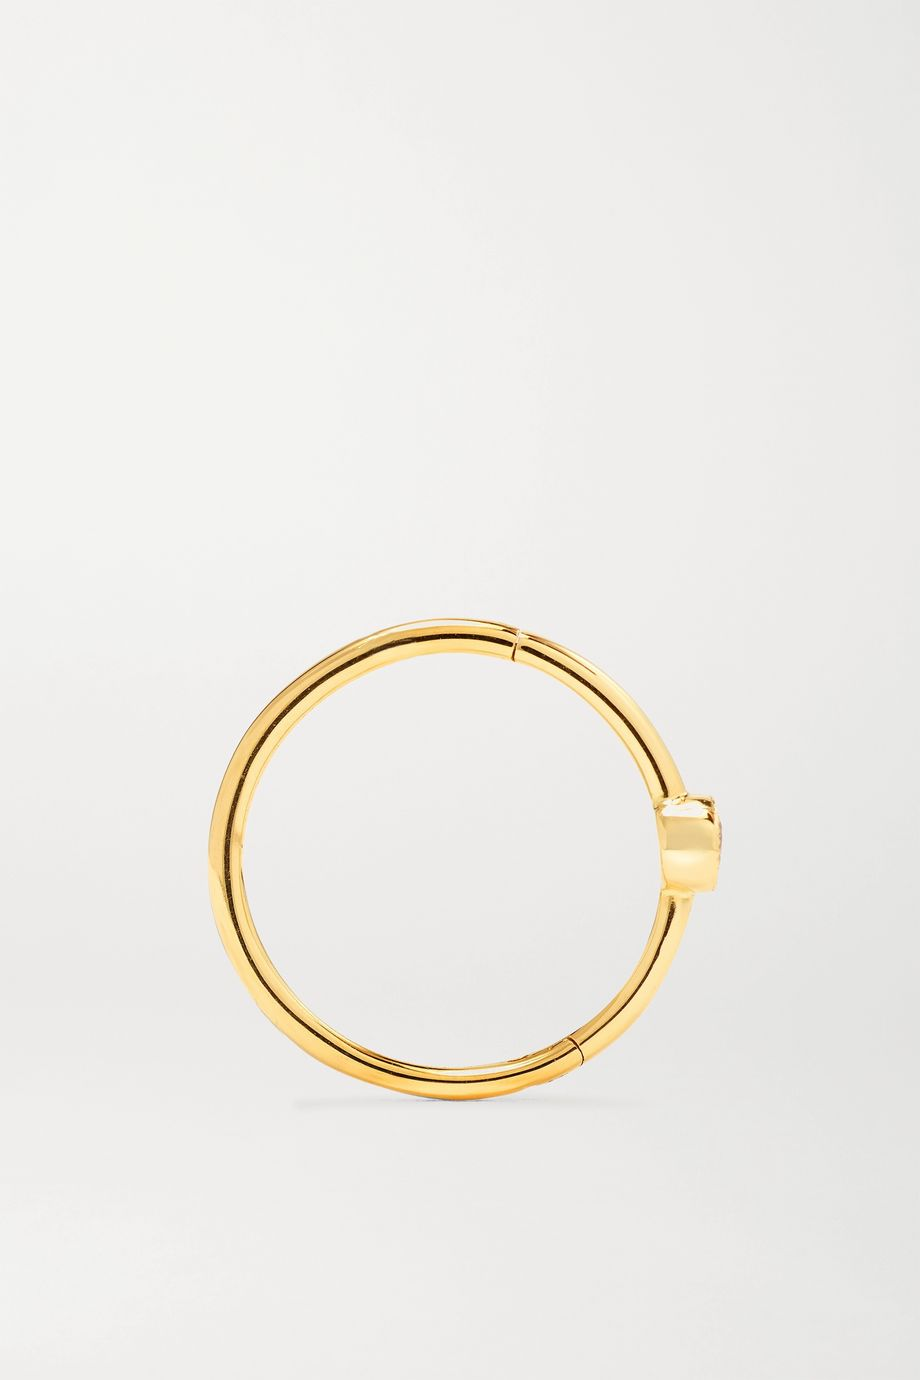 Maria Tash 11mm 18-karat gold hoop earring